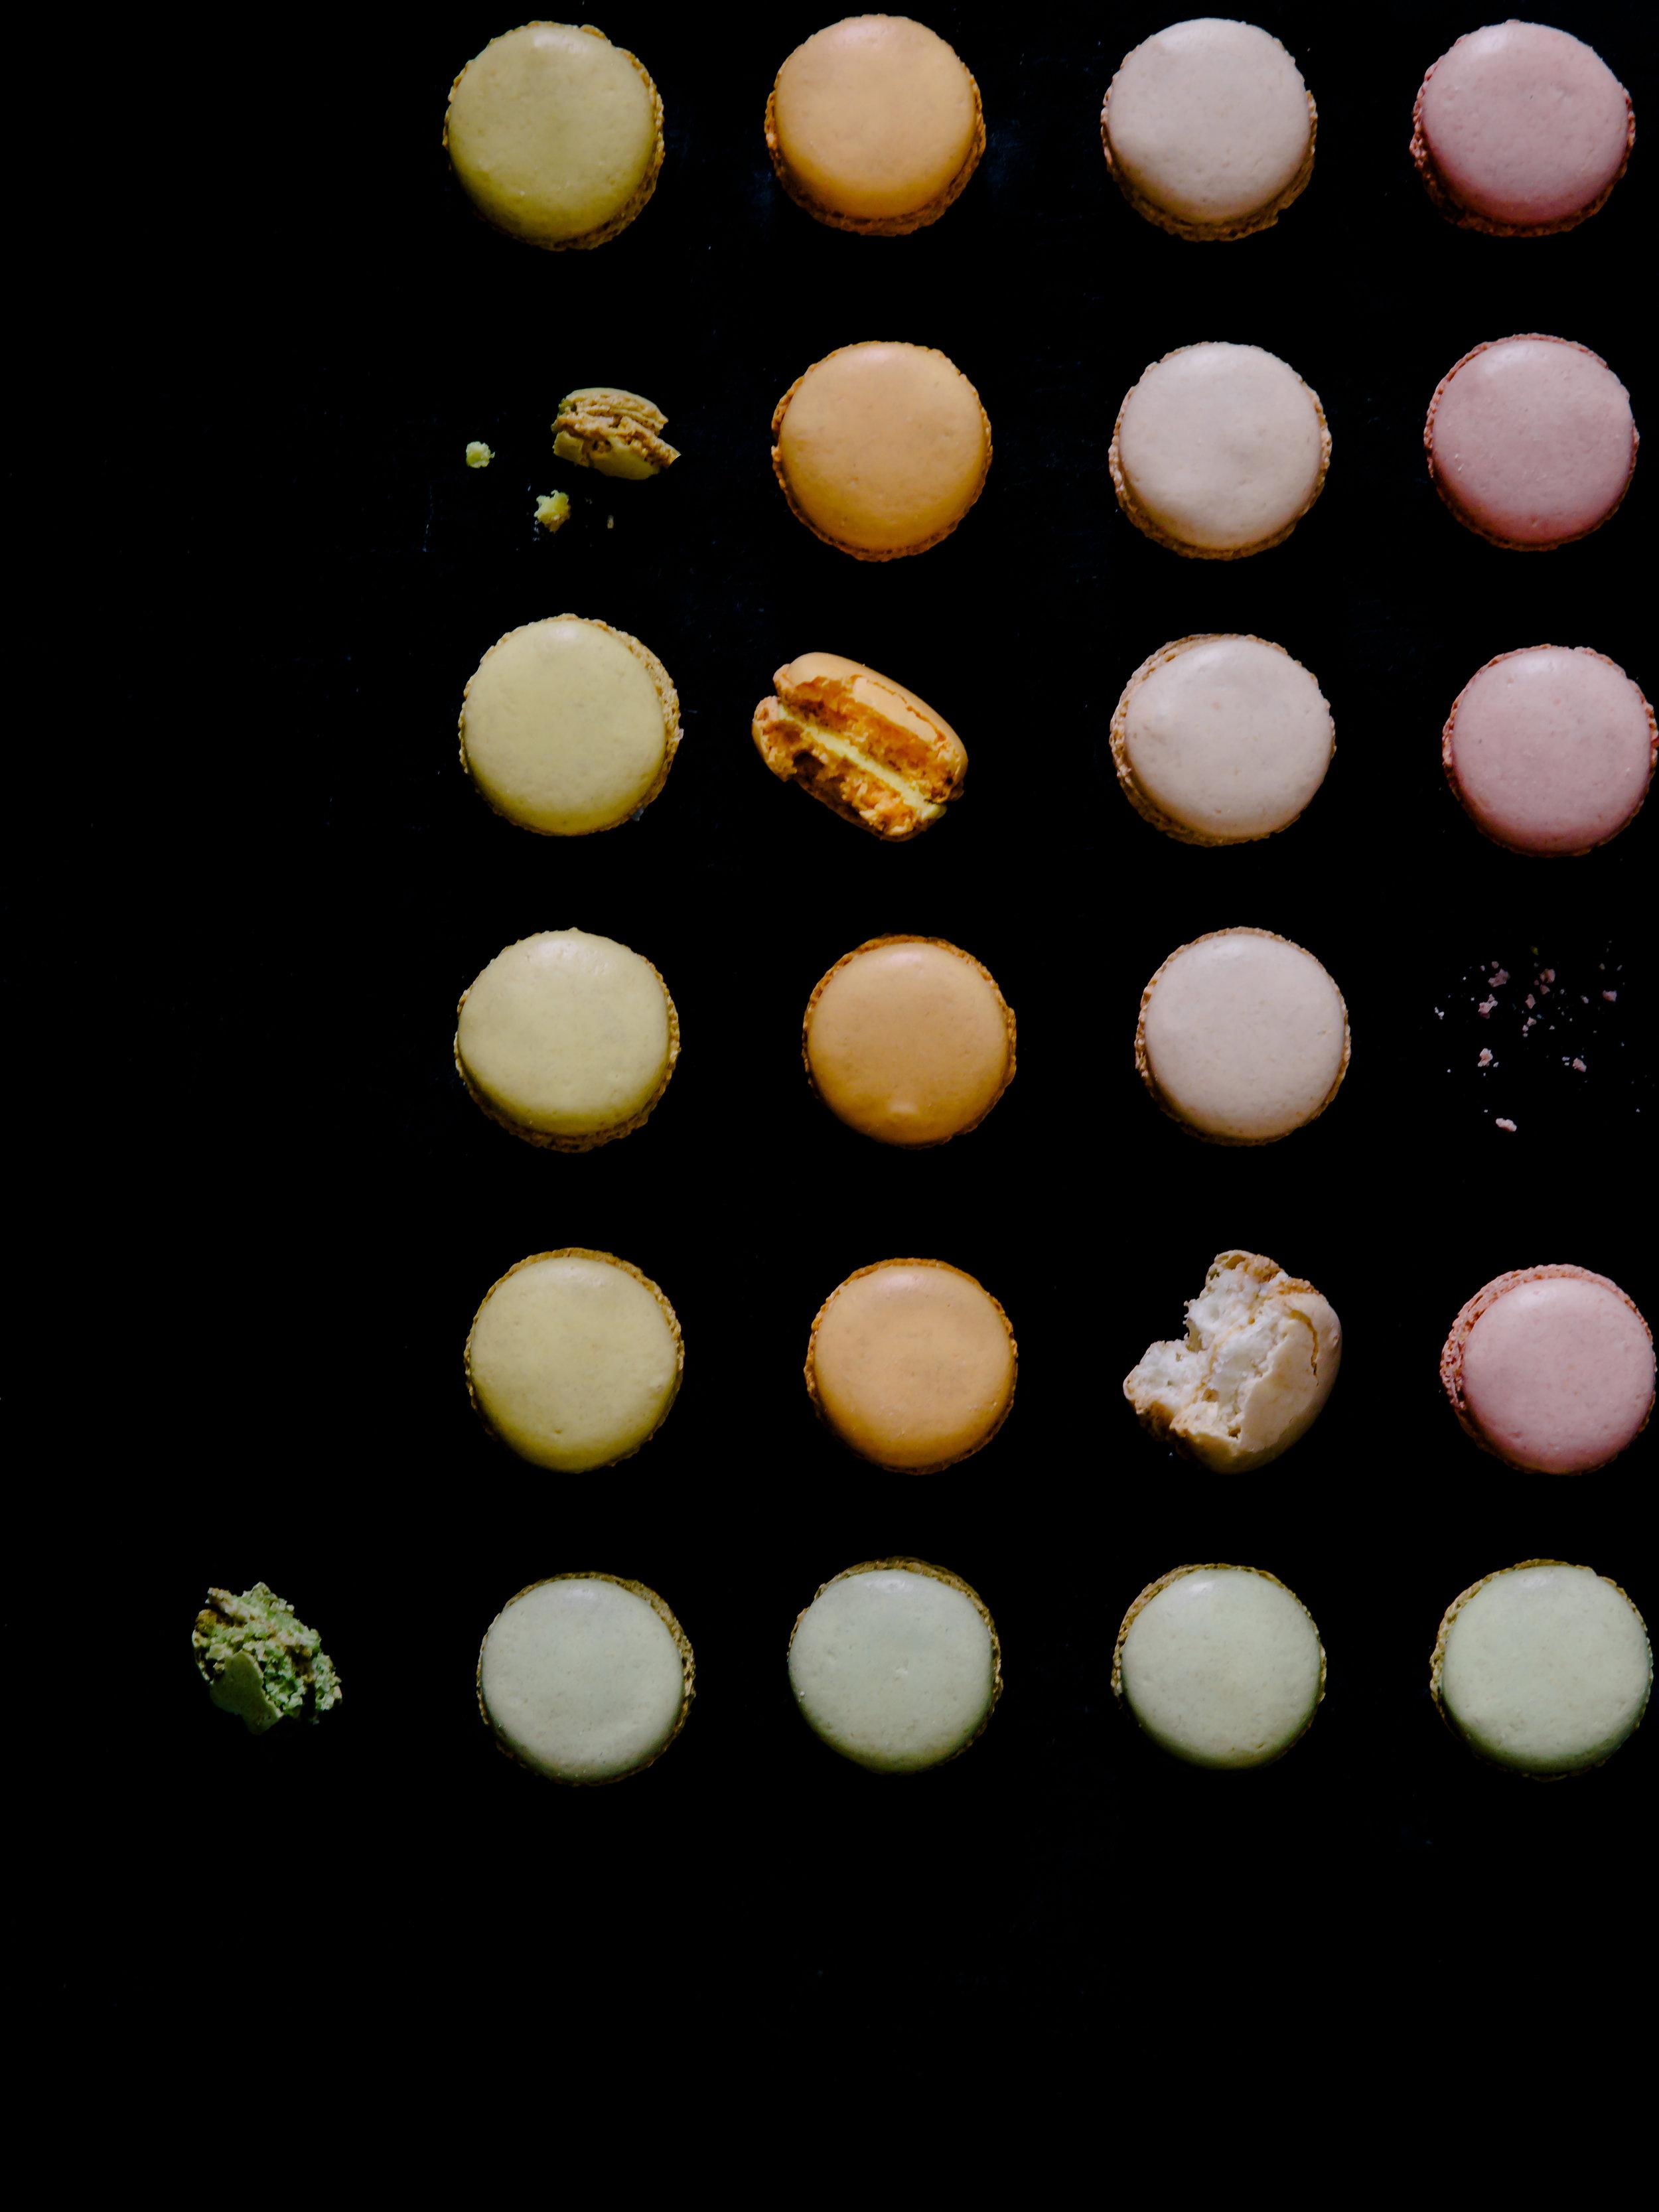 macaron-commercial-3790.jpg